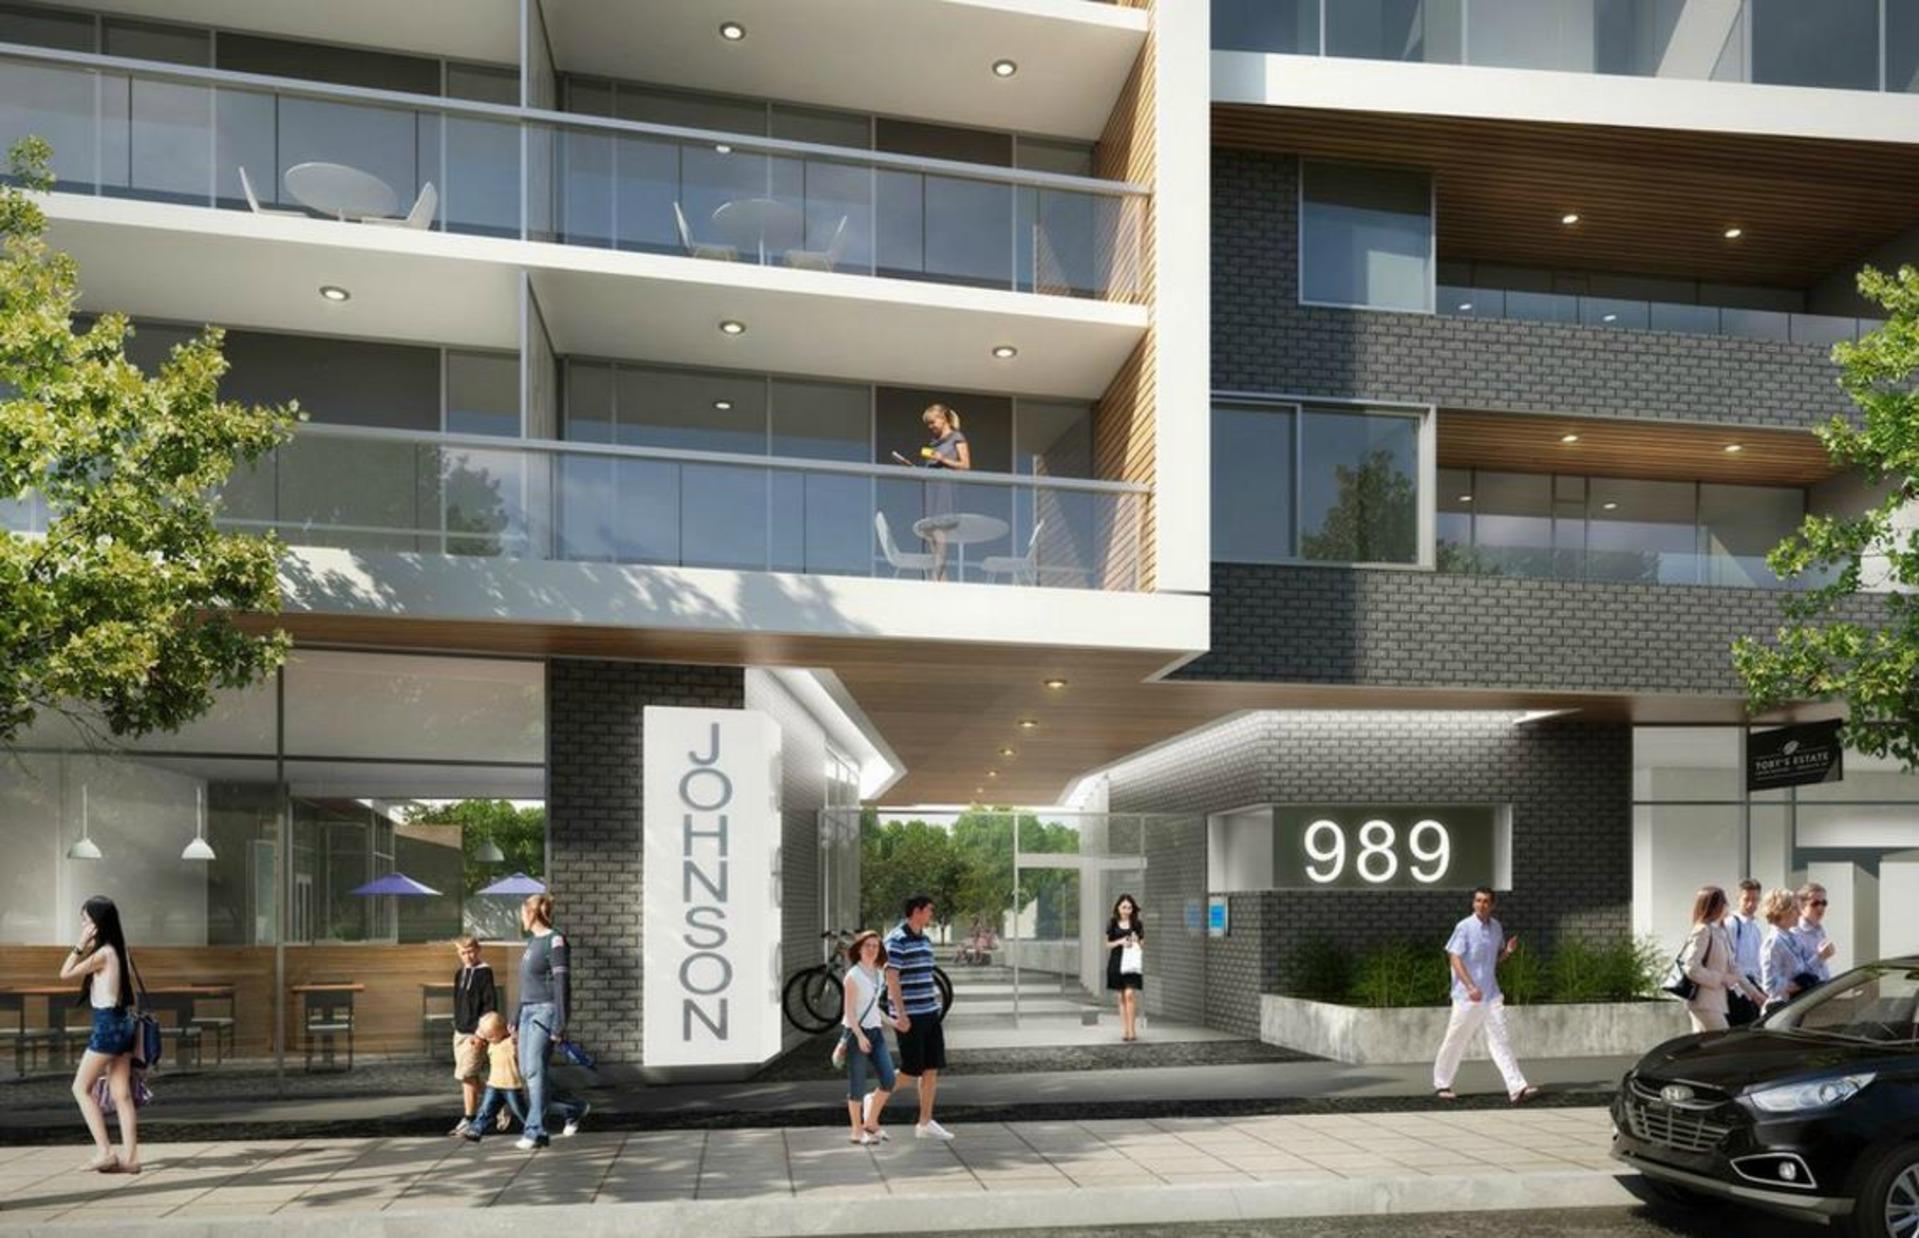 989-johnson-street-victoria-bc at 989 Victoria (989 Johnson Street, Downtown and Harris Green, Victoria)